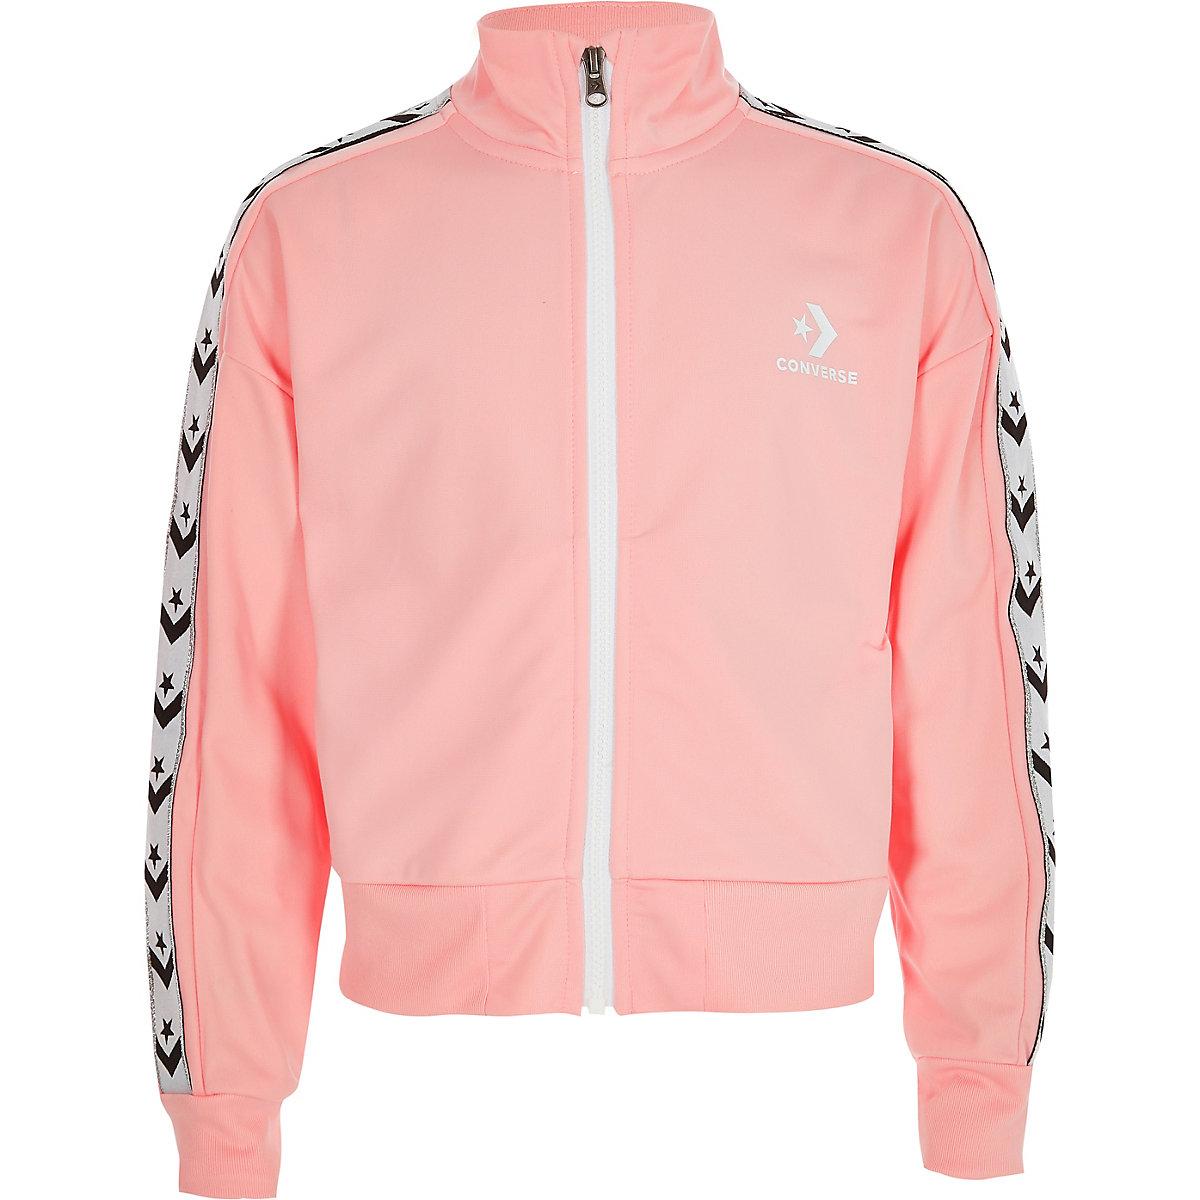 Girls Converse light pink tracksuit jacket